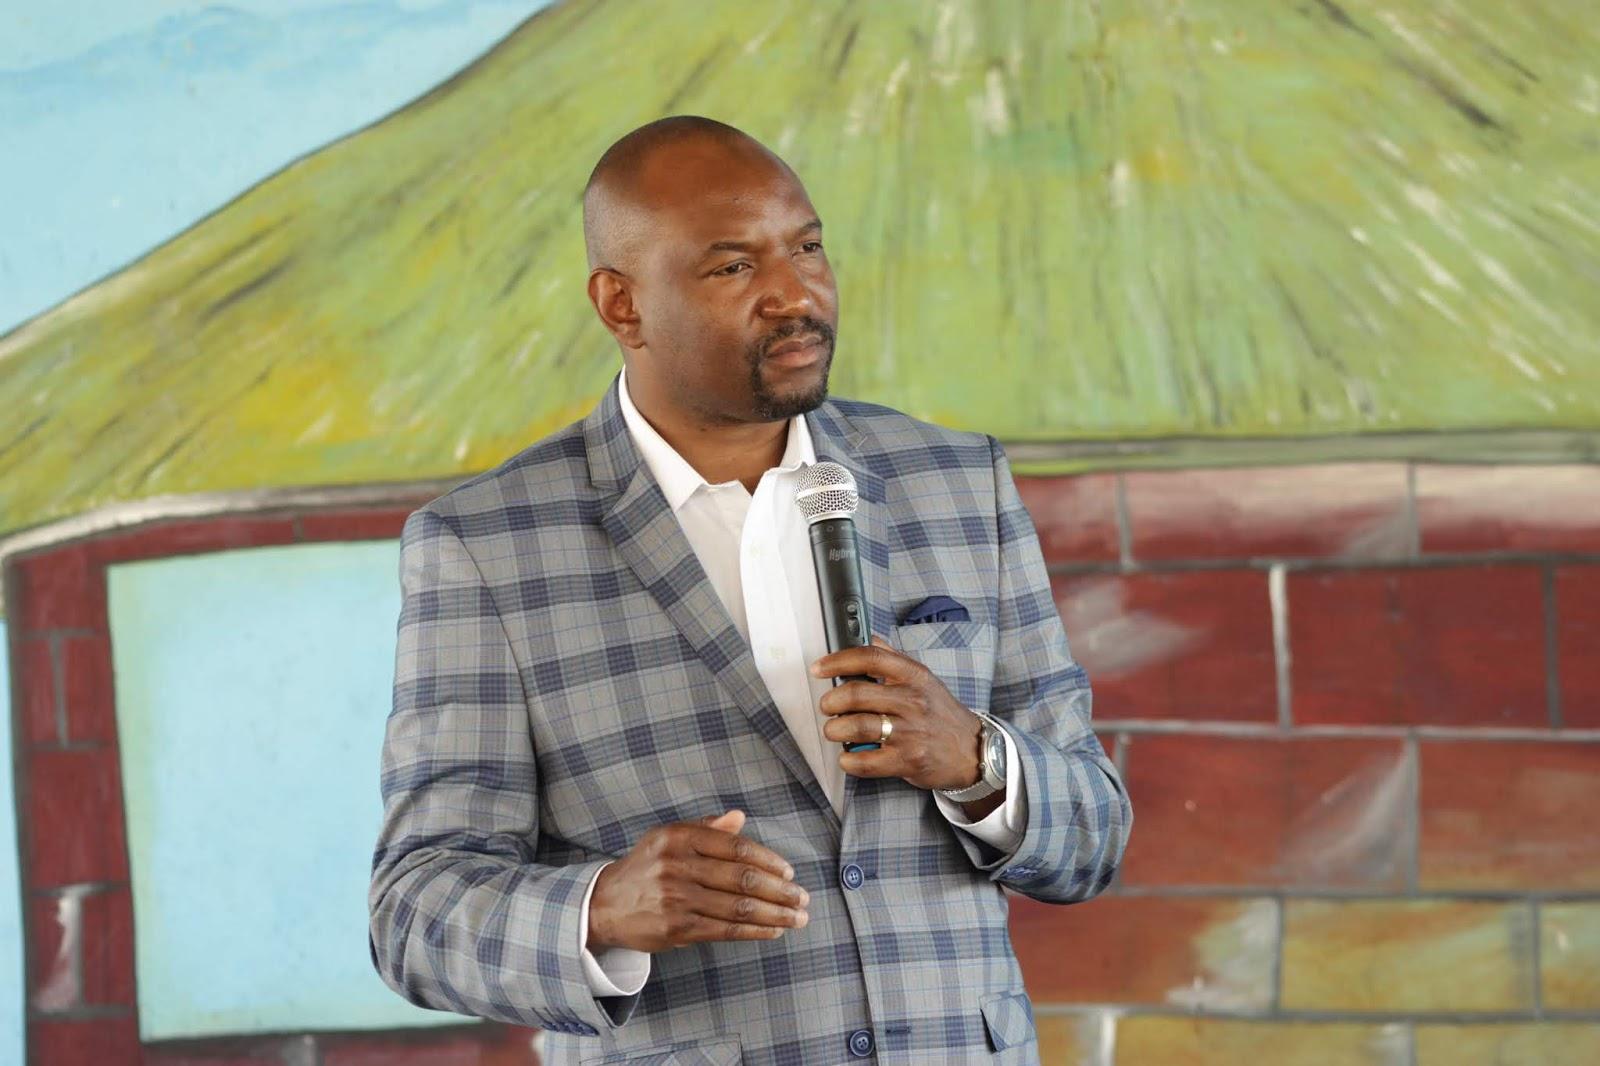 Pastor S. Chirisa Of Wisdom City Church Teaches On Relationships  At Tiyambuke 2018 Day Two